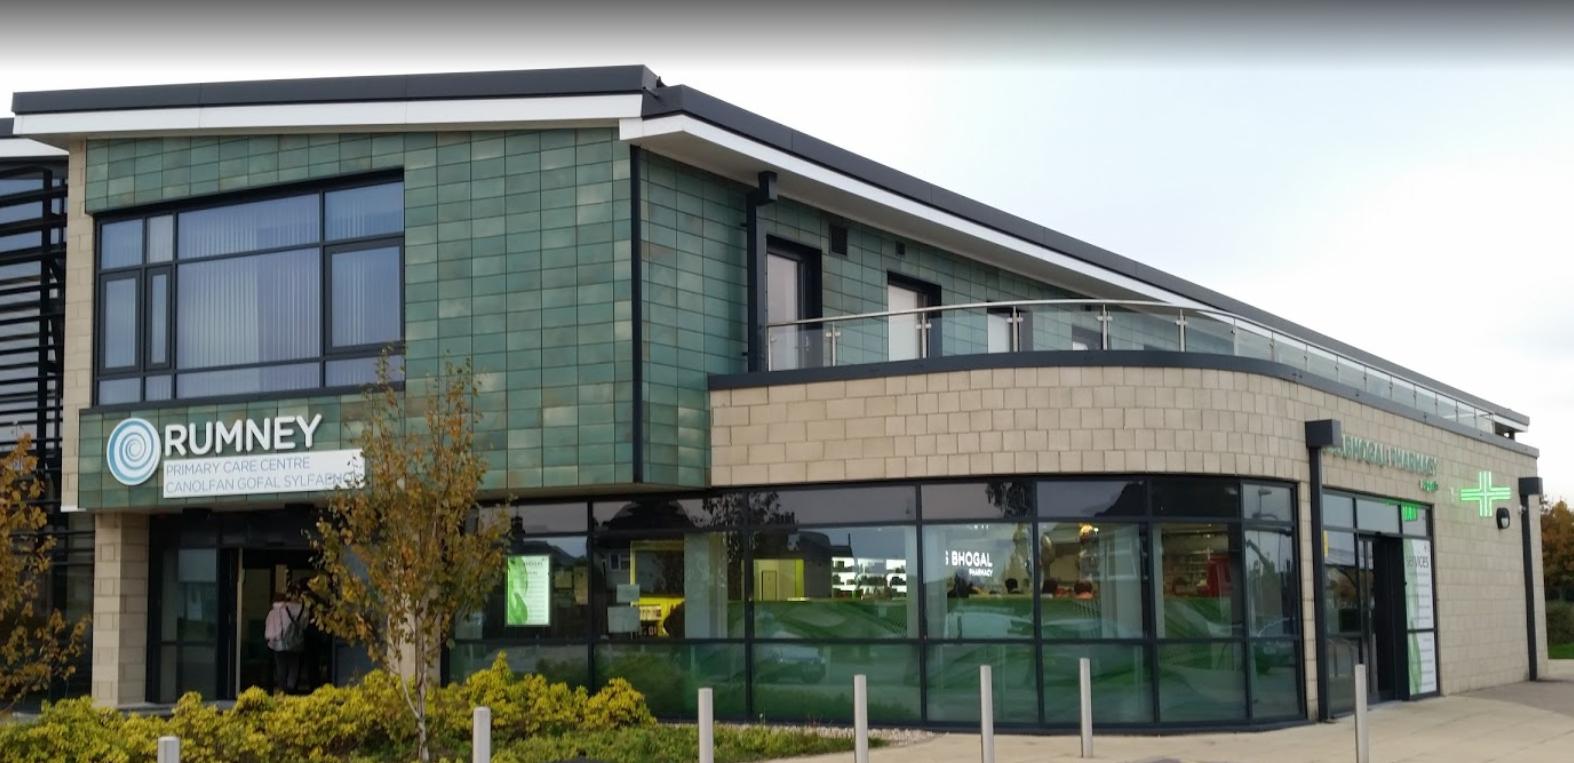 Rumney Centre Cardiff